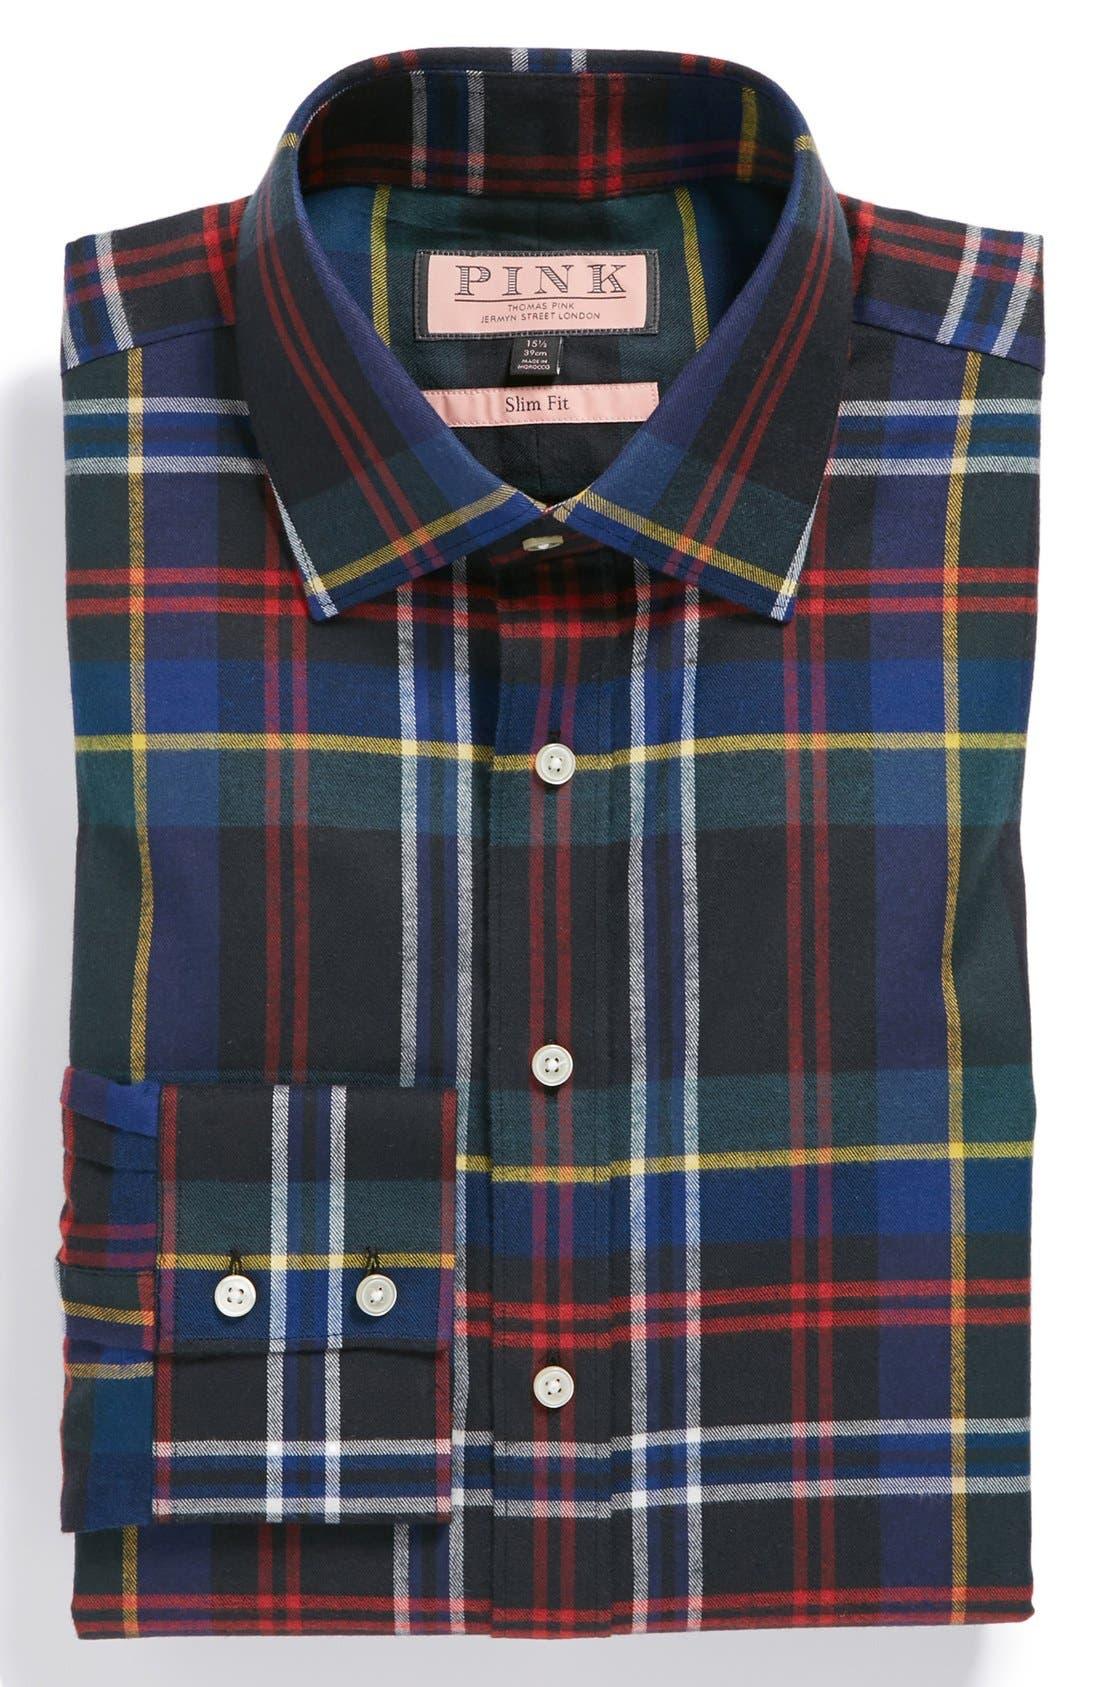 Main Image - Thomas Pink 'Promenade' Slim Fit Dress Shirt